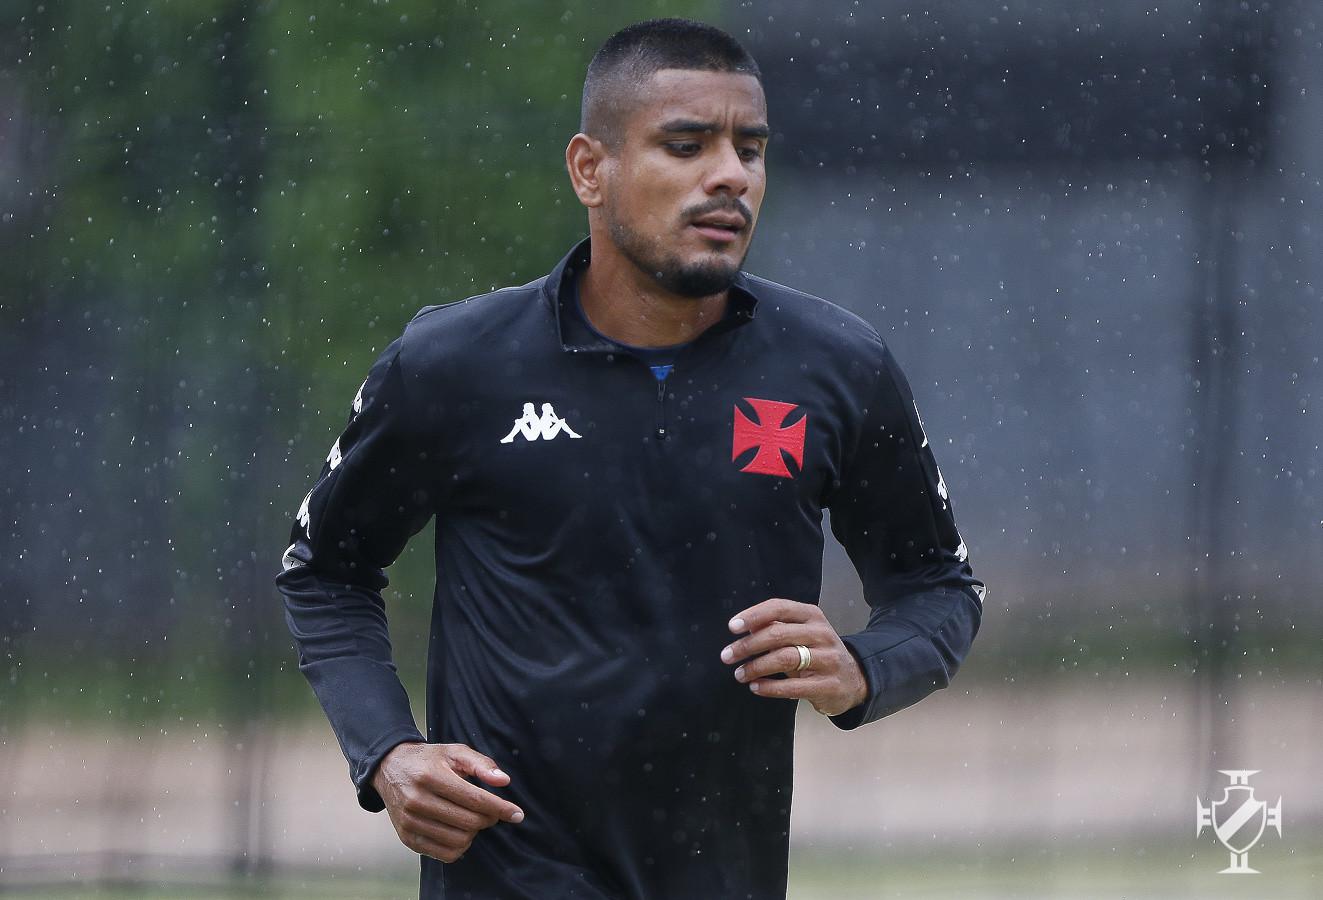 Léo Matos durante treinamento no CT Moacyr Barbosa